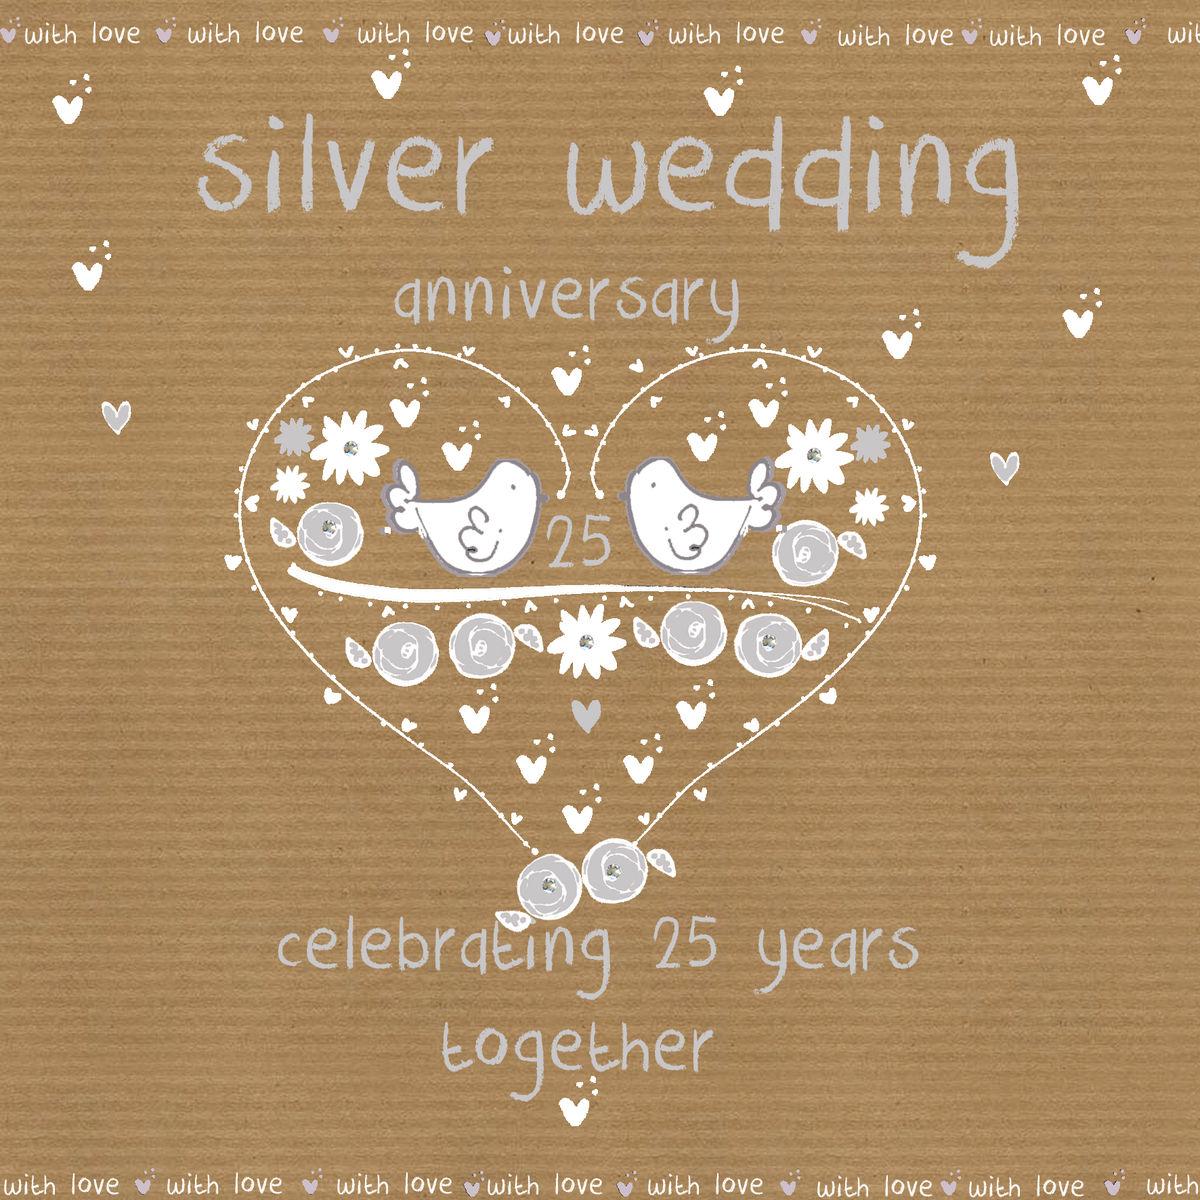 Twenty Fifth Wedding Anniversary Gift Ideas: Silver Wedding Anniversary Card